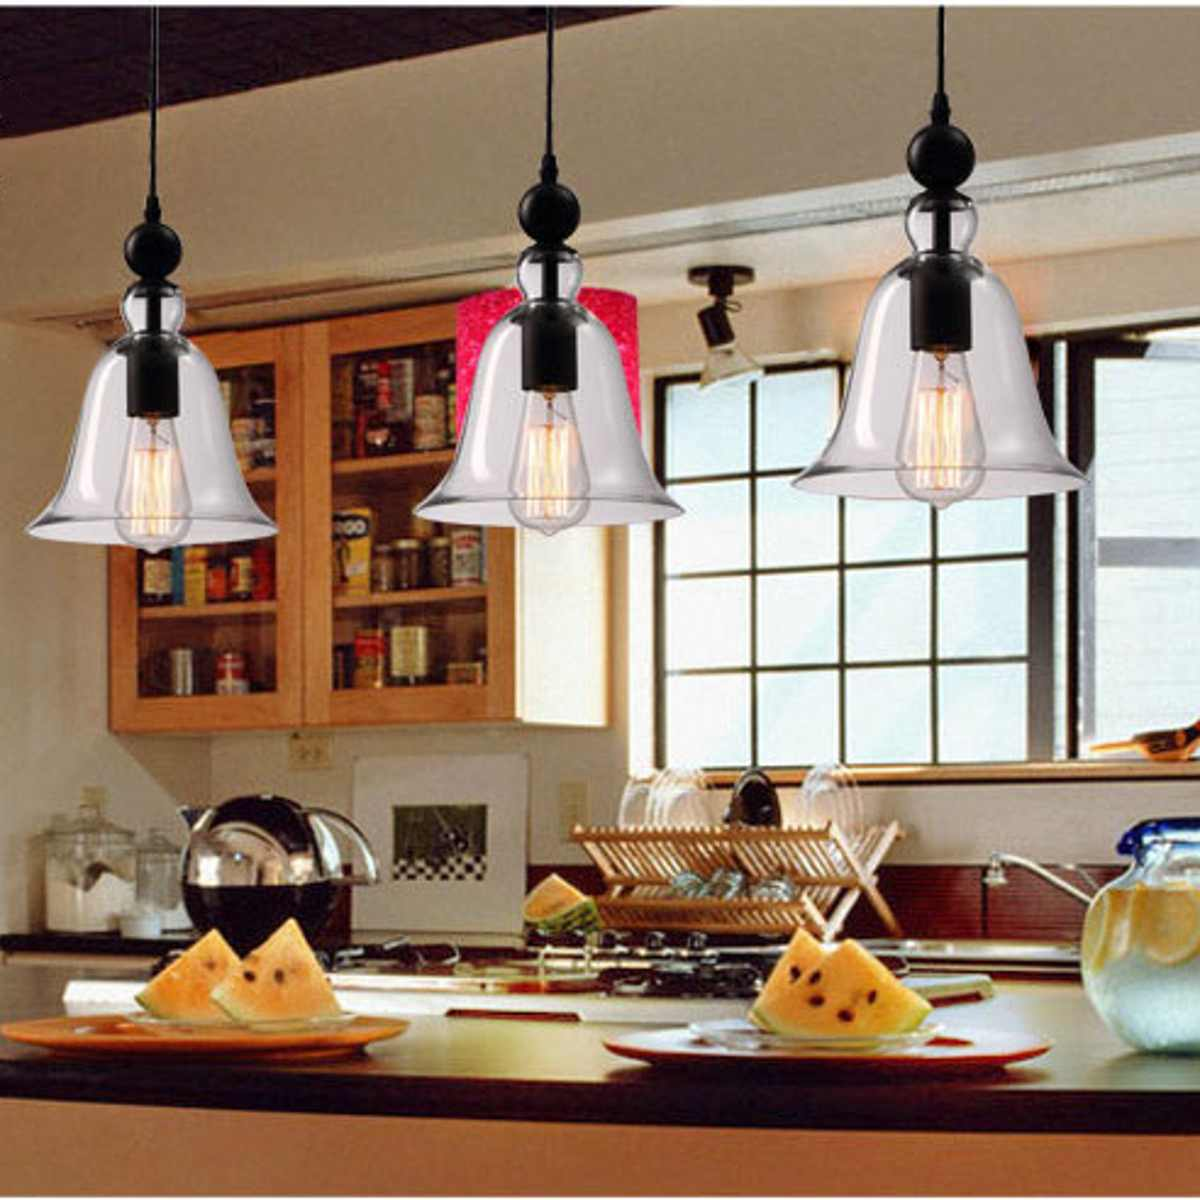 Retro Pendant Light Lamp Glass Iron Pendant Light Home LED Lamp Lighting With Bulb Industrial Design Lighting Fixture 2019 NewRetro Pendant Light Lamp Glass Iron Pendant Light Home LED Lamp Lighting With Bulb Industrial Design Lighting Fixture 2019 New